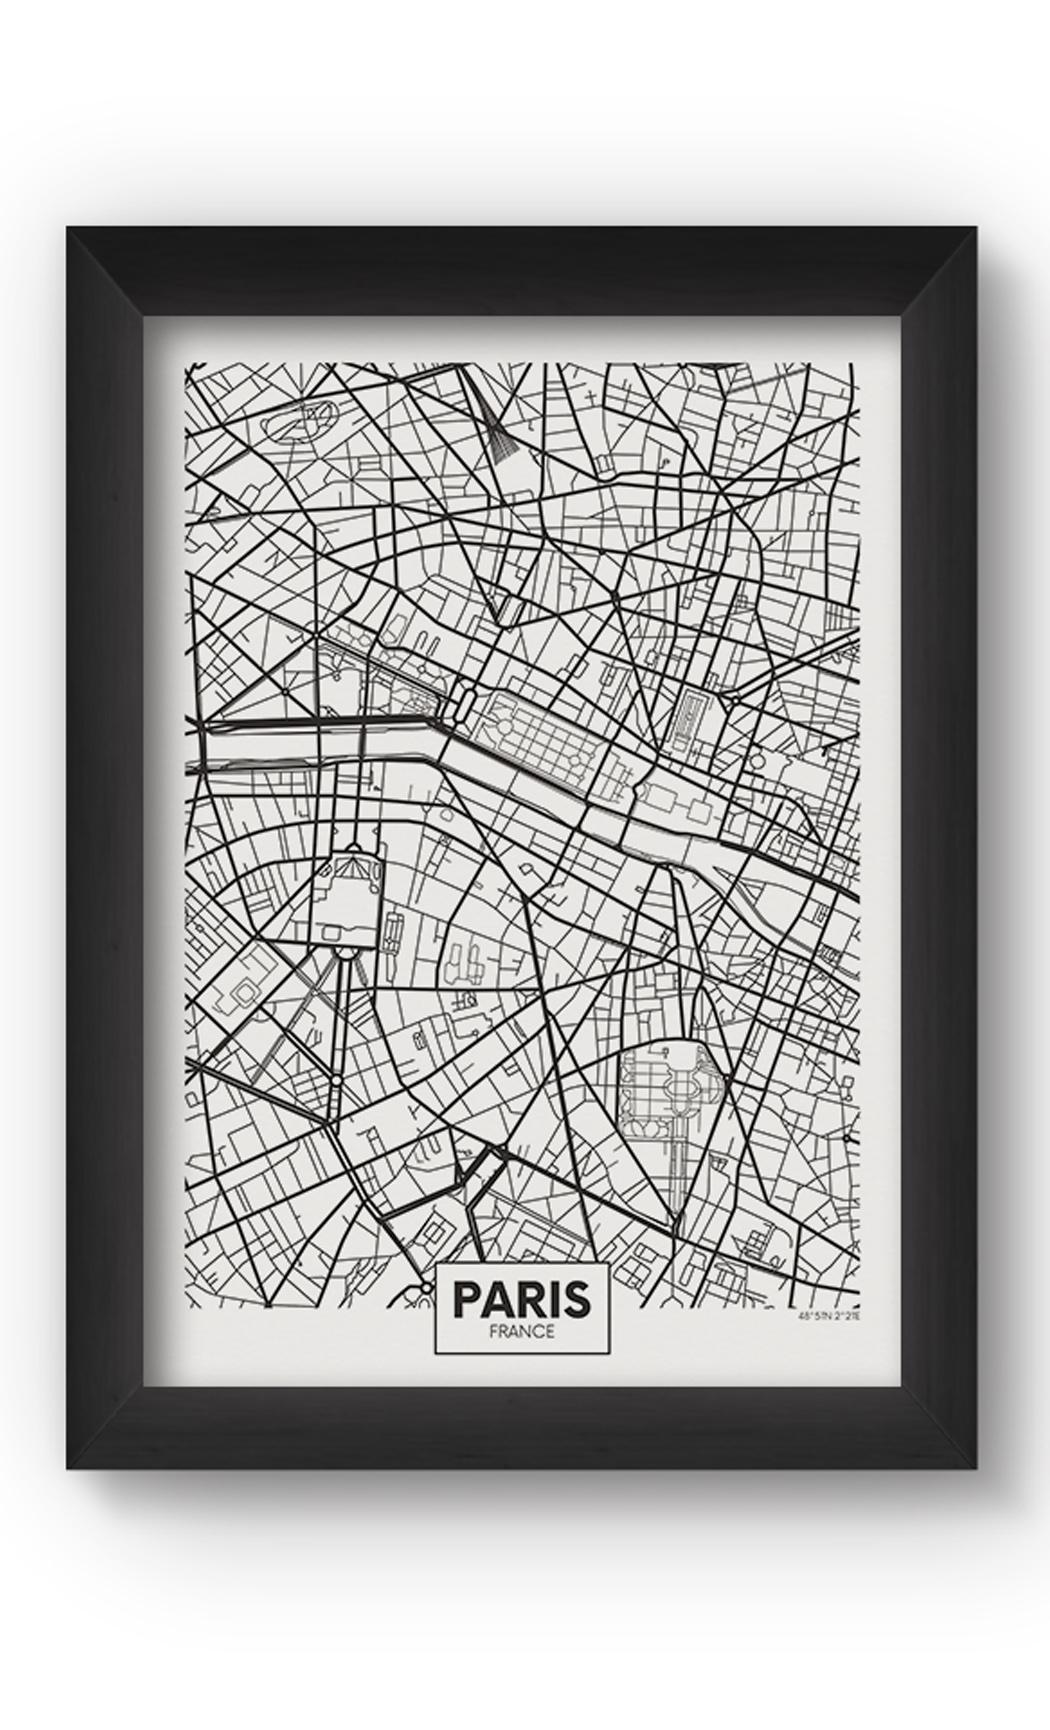 Black & White PARIS MAP Poster. Buy Online.